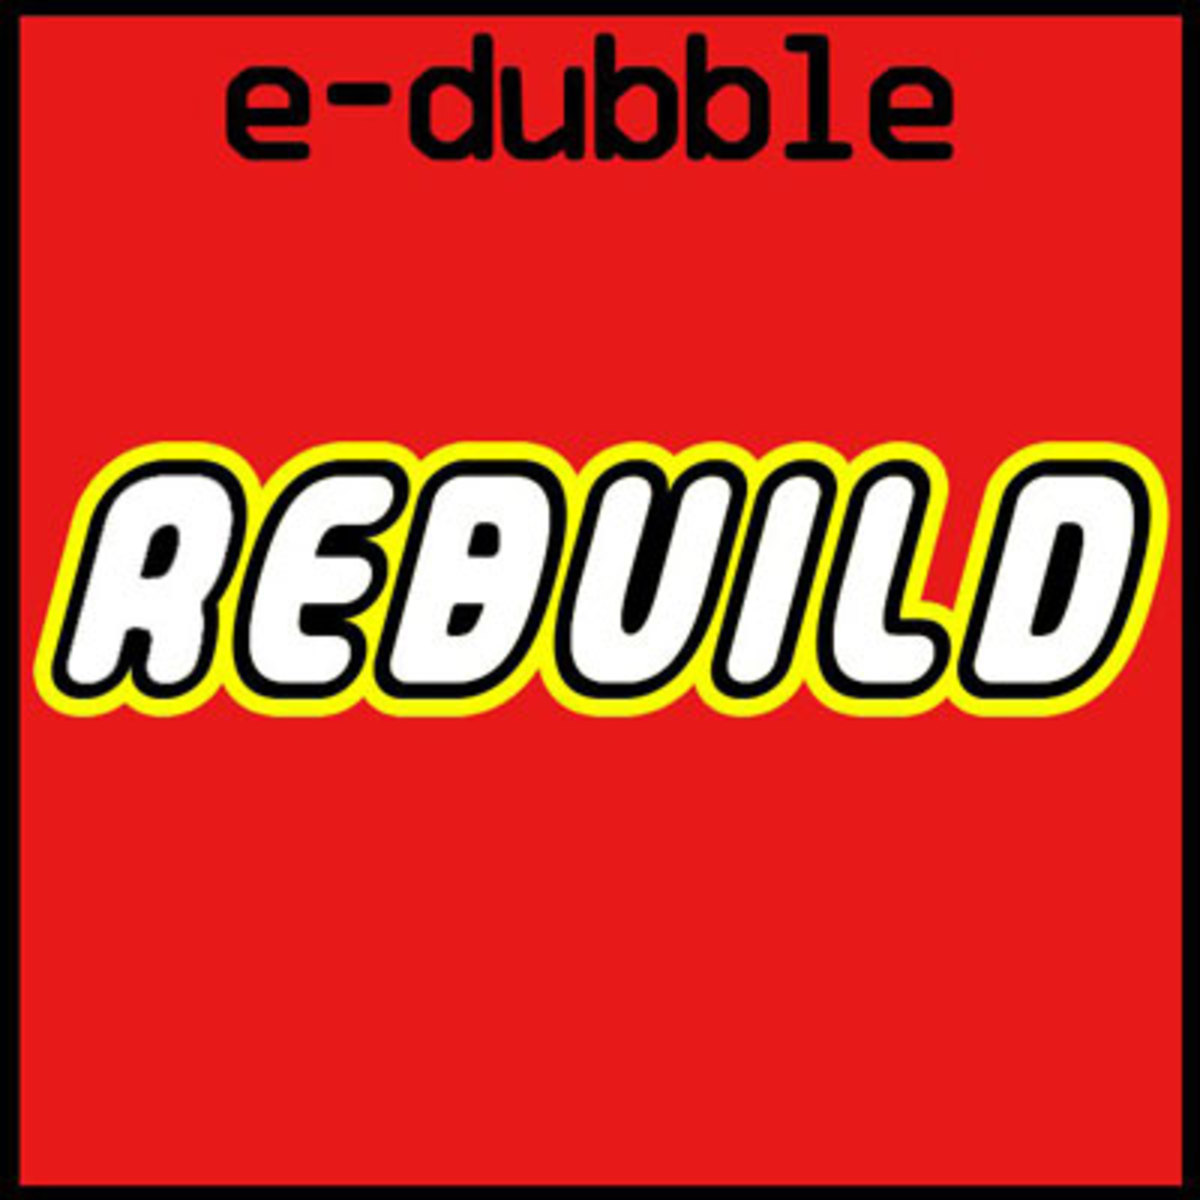 e-dubble-rebuild.jpg